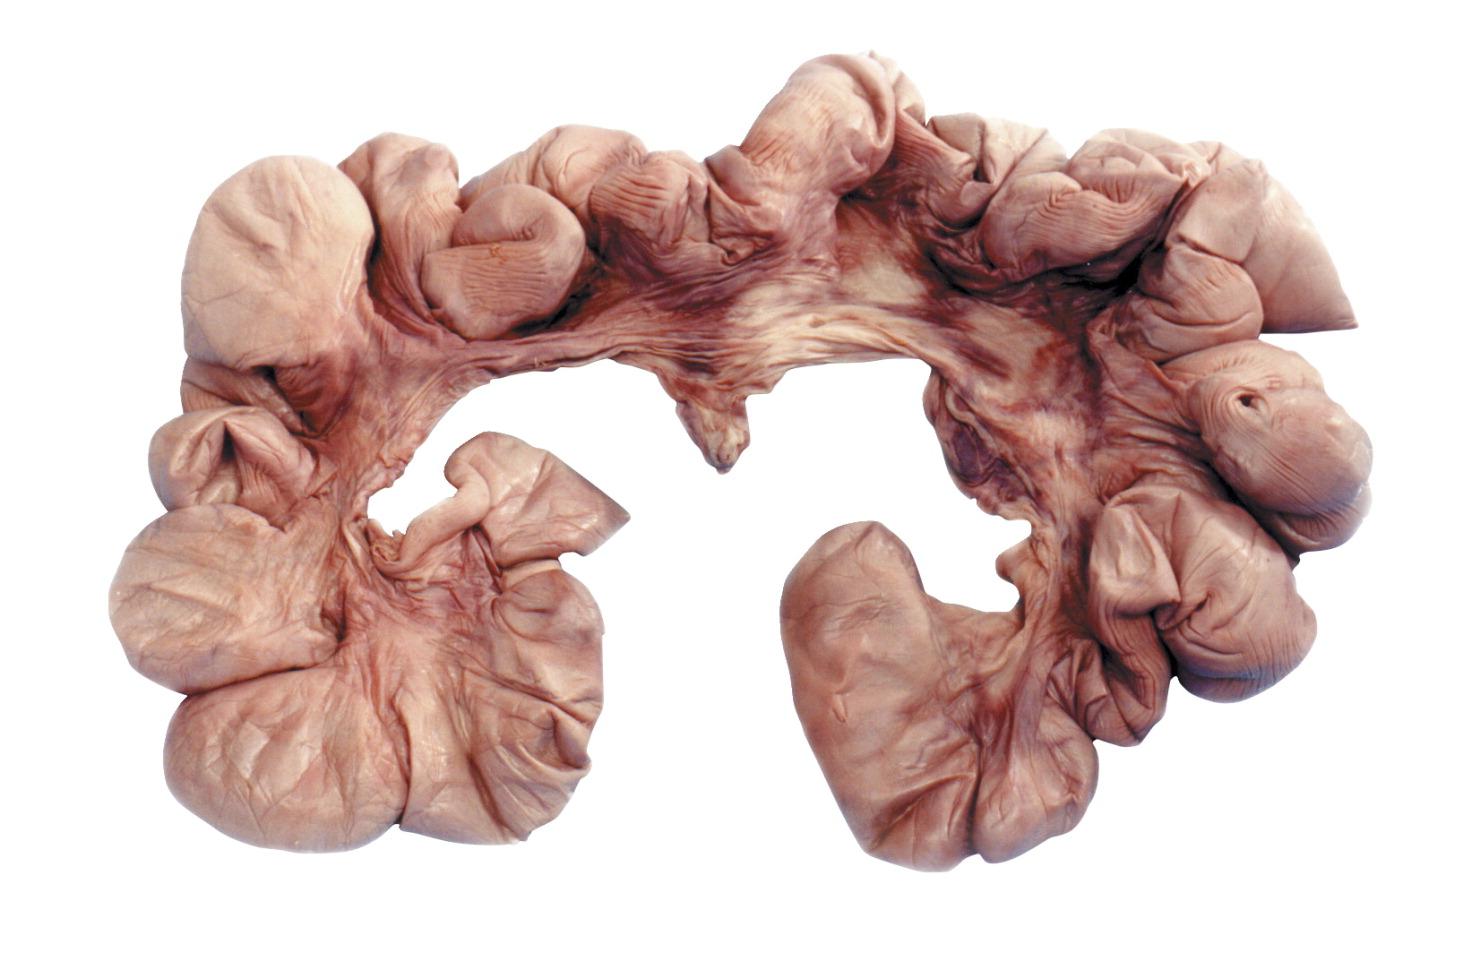 Preserved Pig Organs - FREY SCIENTIFIC & CPO SCIENCE